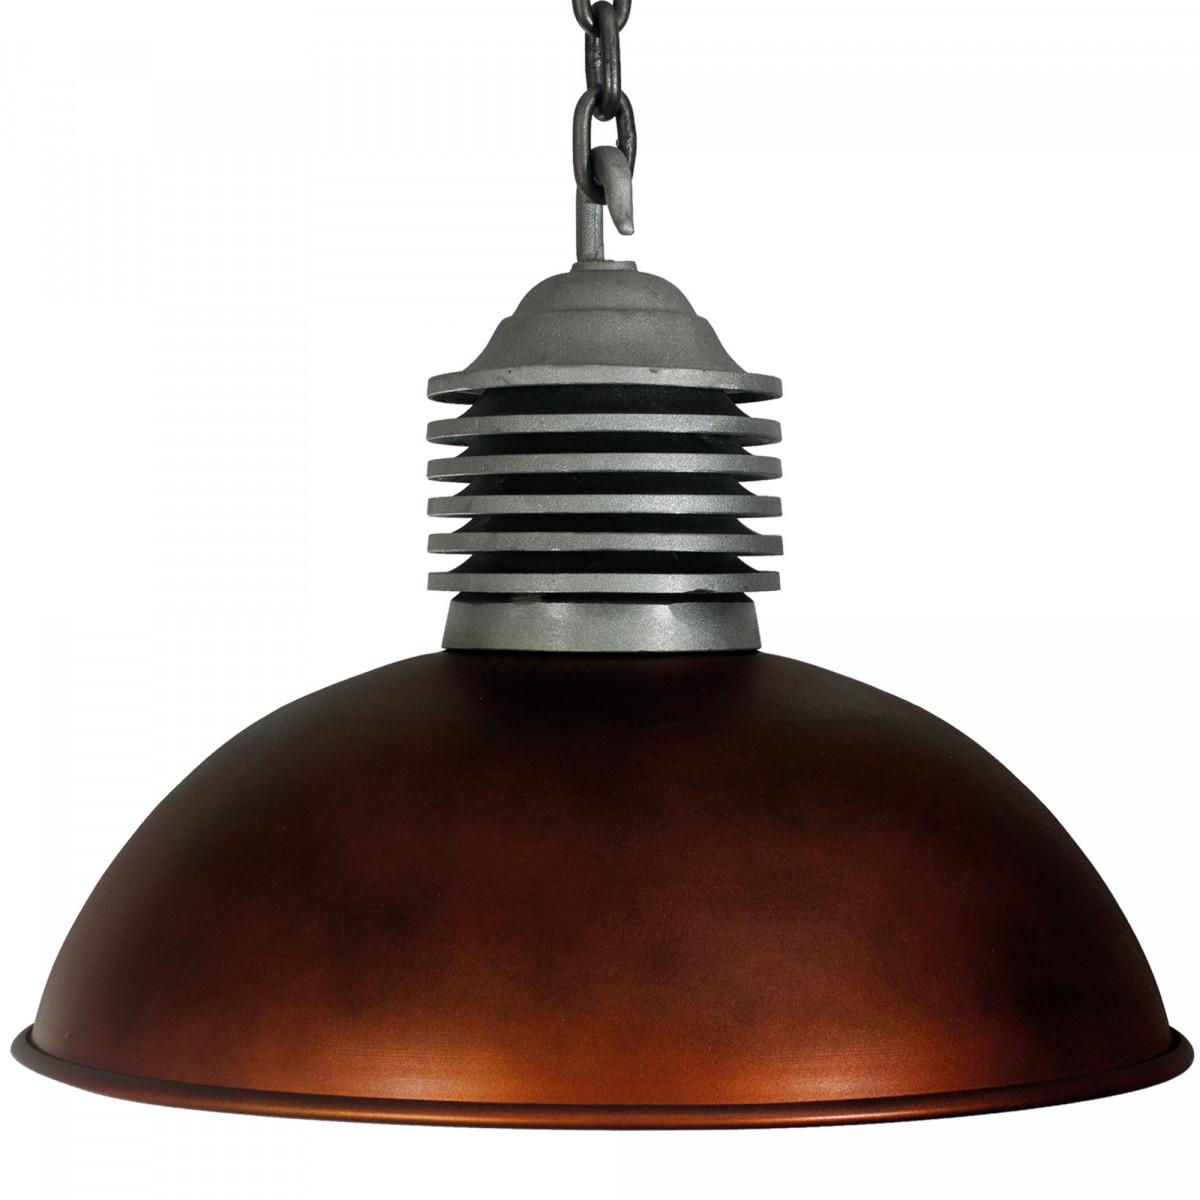 Kettinglamp Old Industry Dark Messing Color